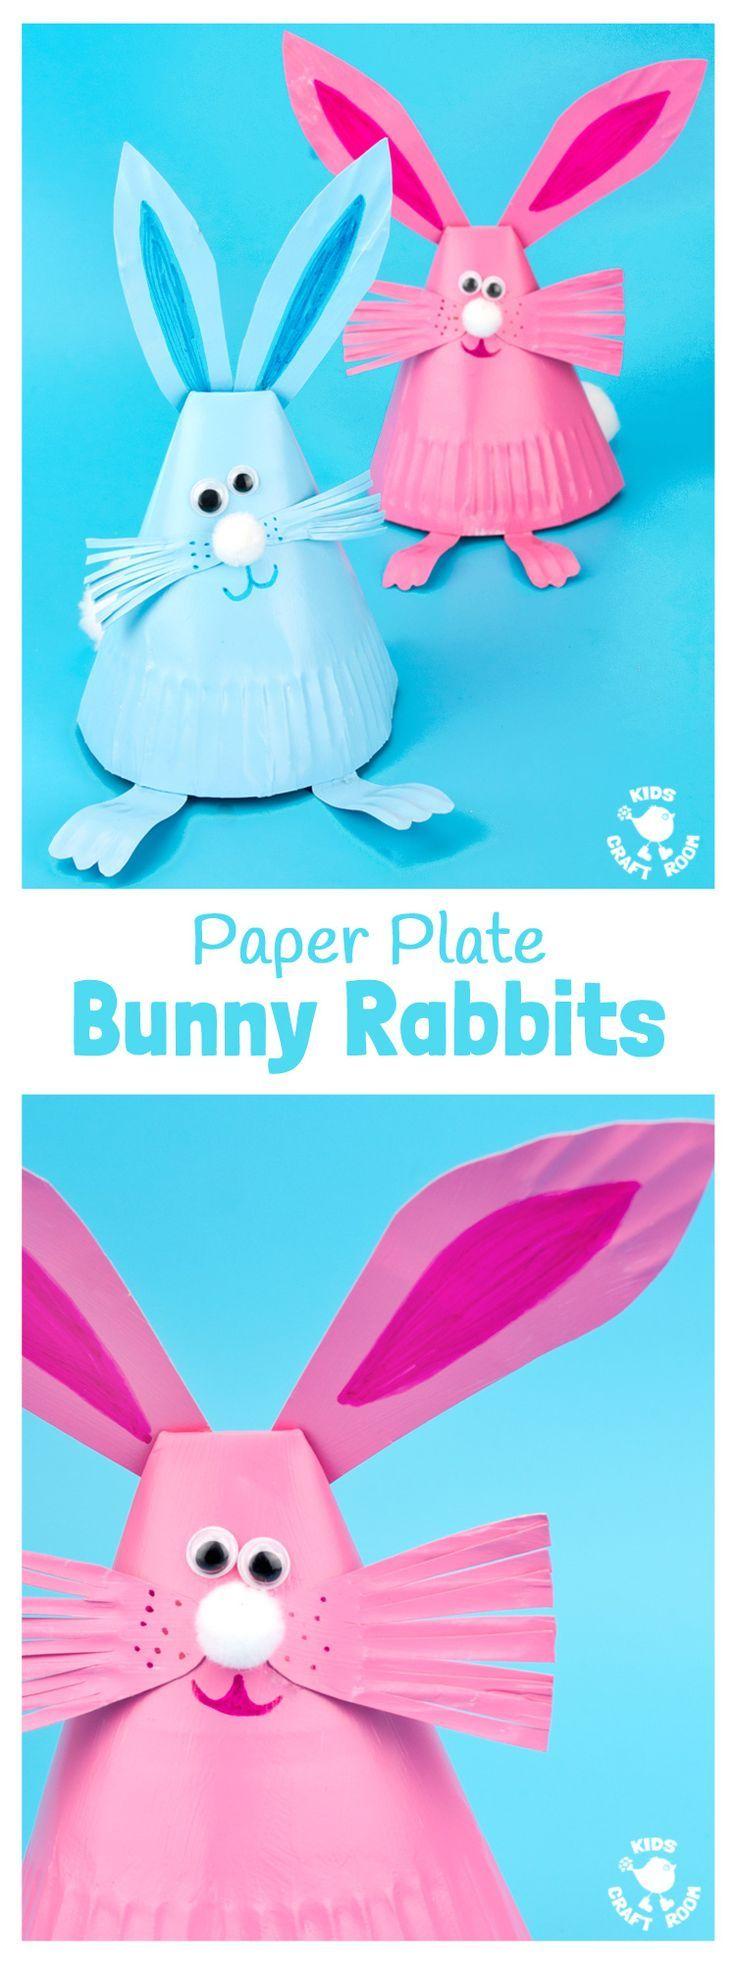 Paper Plate Bunnies  sc 1 st  Pinterest & 558 best Paper Plate Crafts images on Pinterest | Paper plate crafts ...